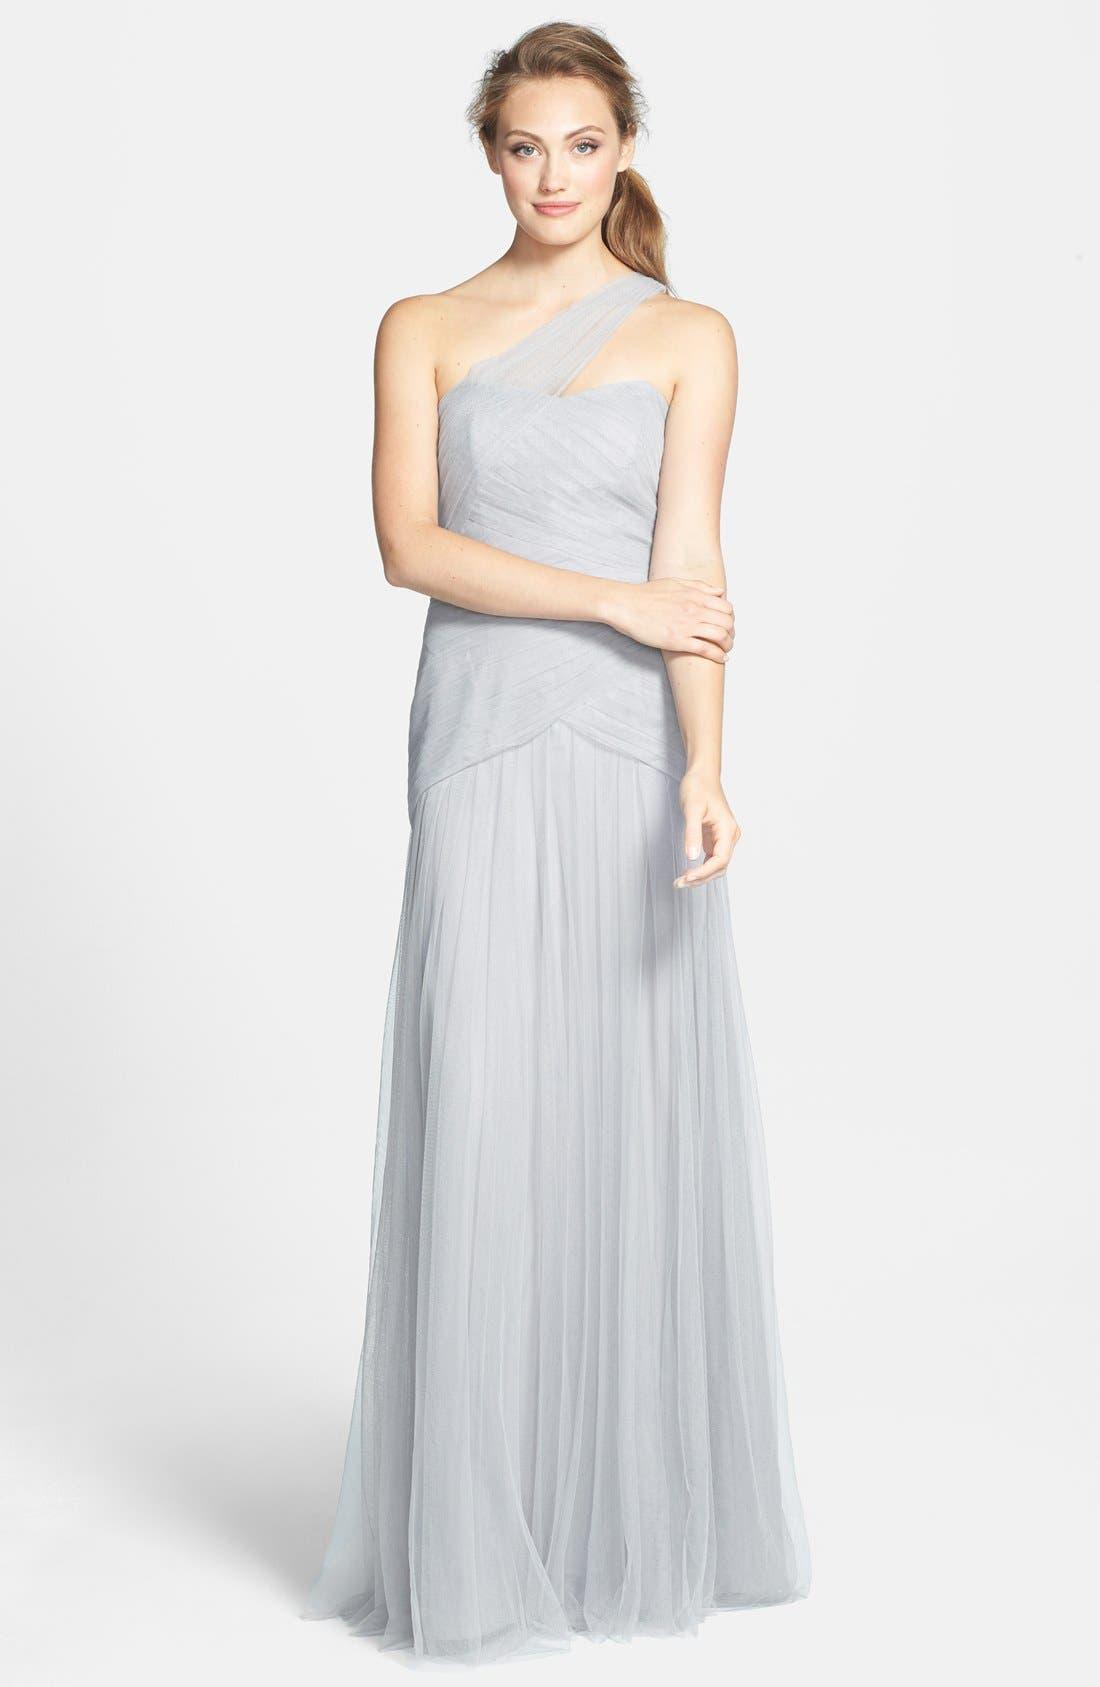 Main Image - Monique Lhuillier Bridesmaids Pleated One-Shoulder Tulle Trumpet Gown